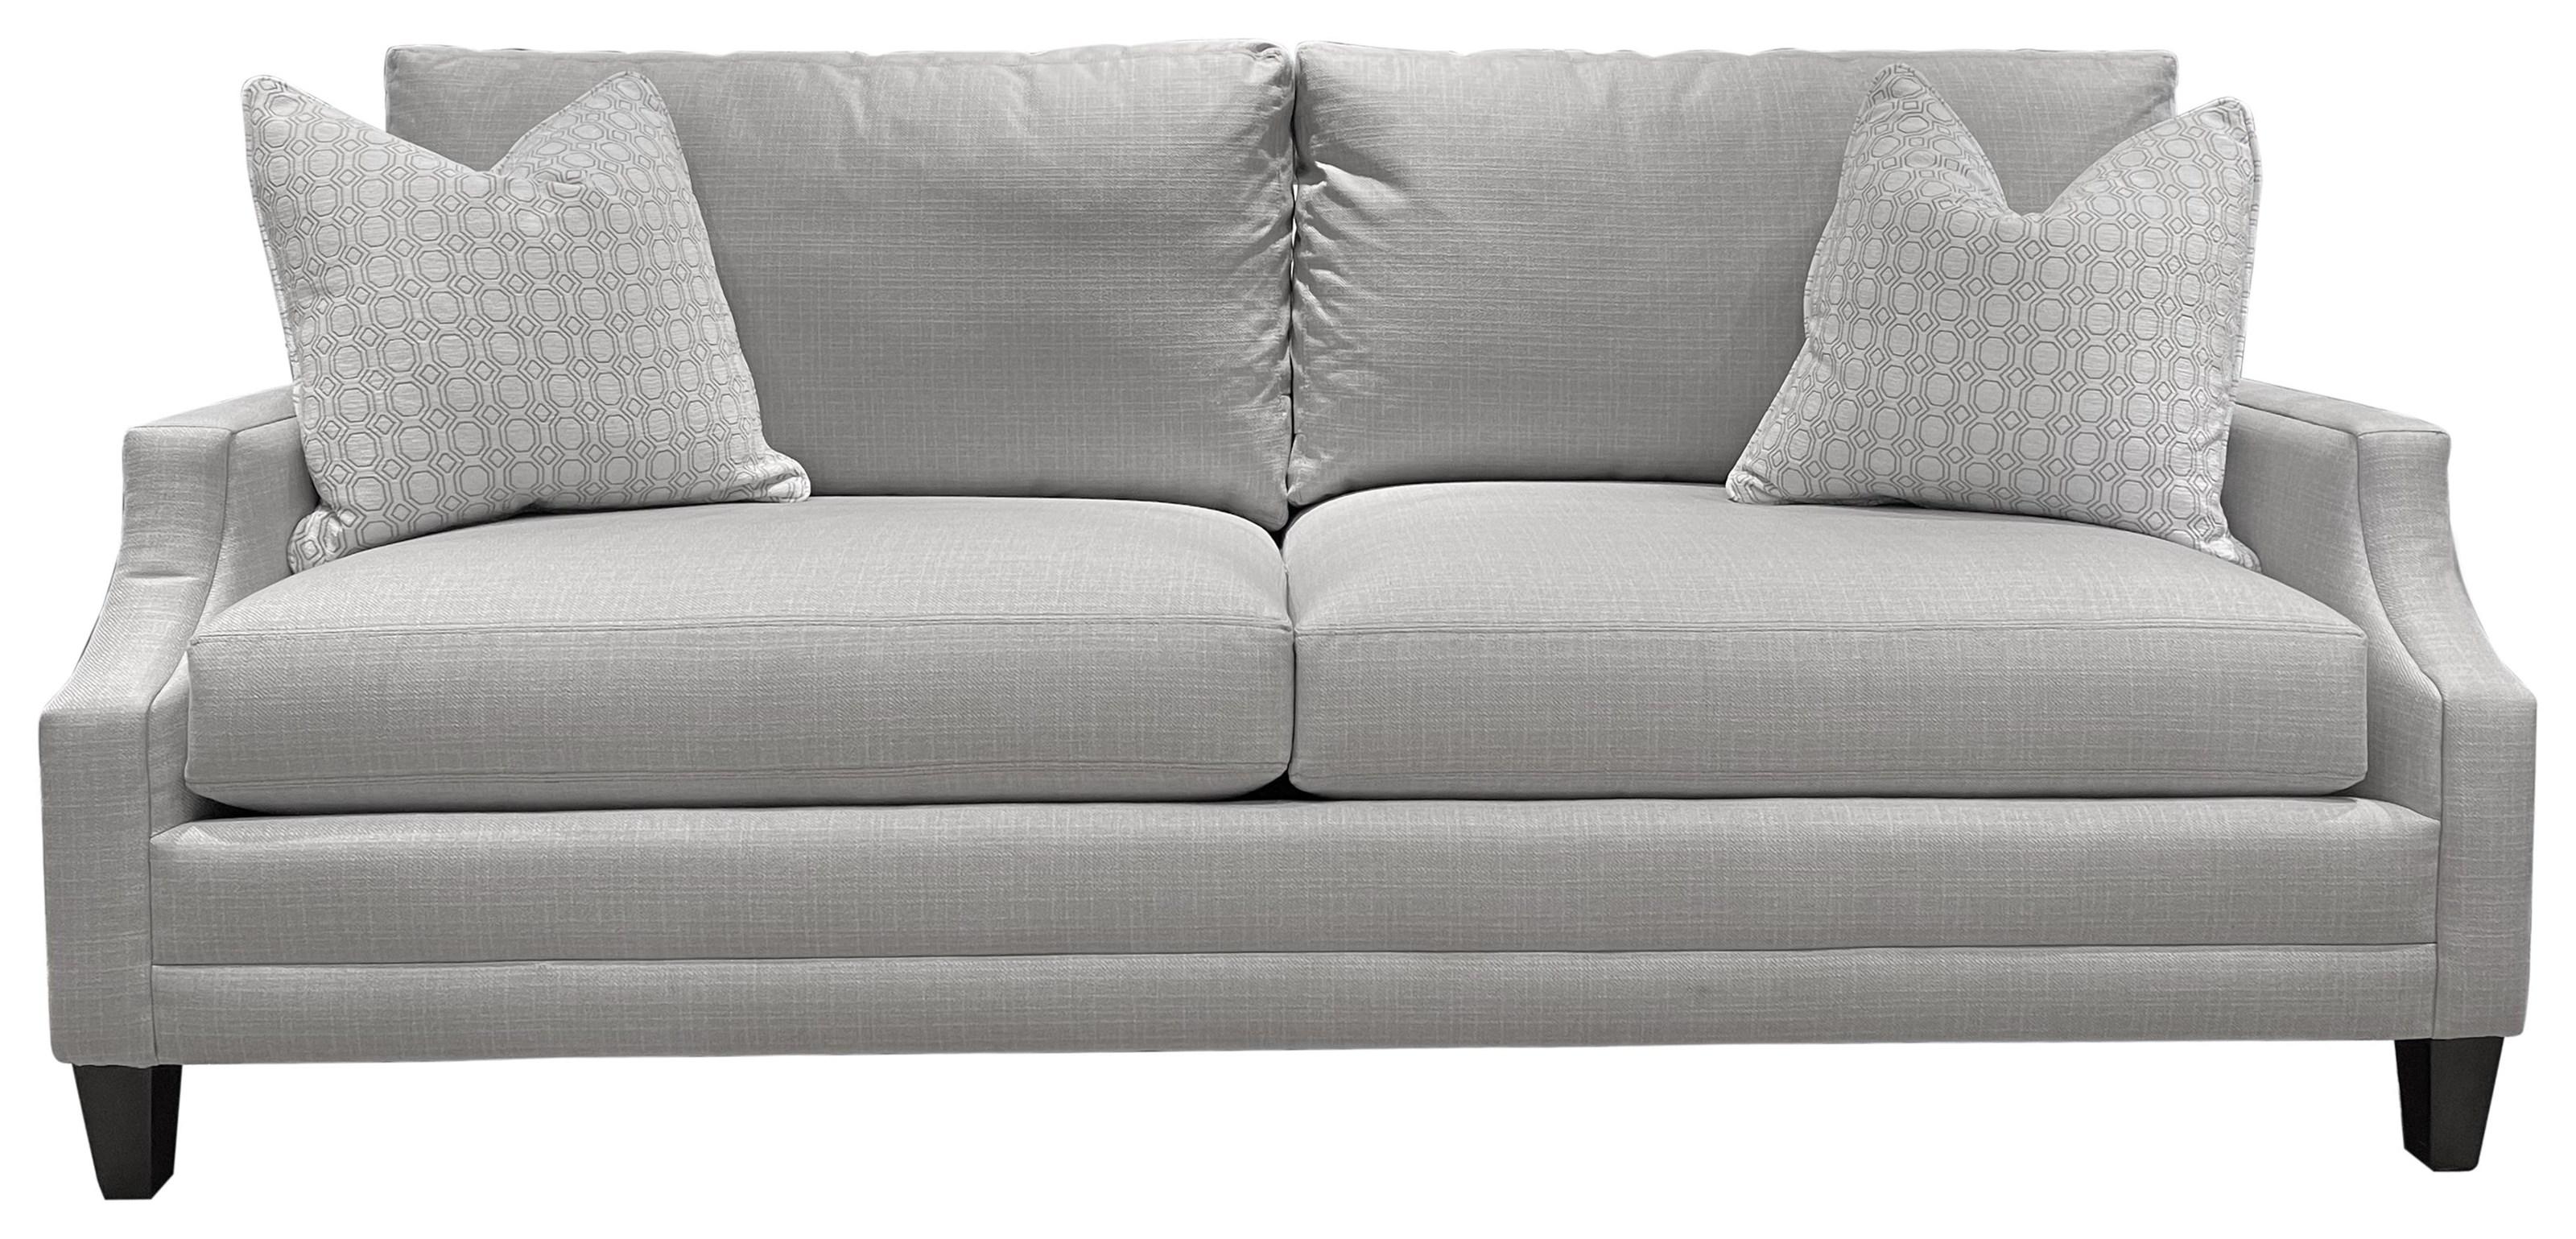 Bristol Sofa by Lexington at C. S. Wo & Sons Hawaii